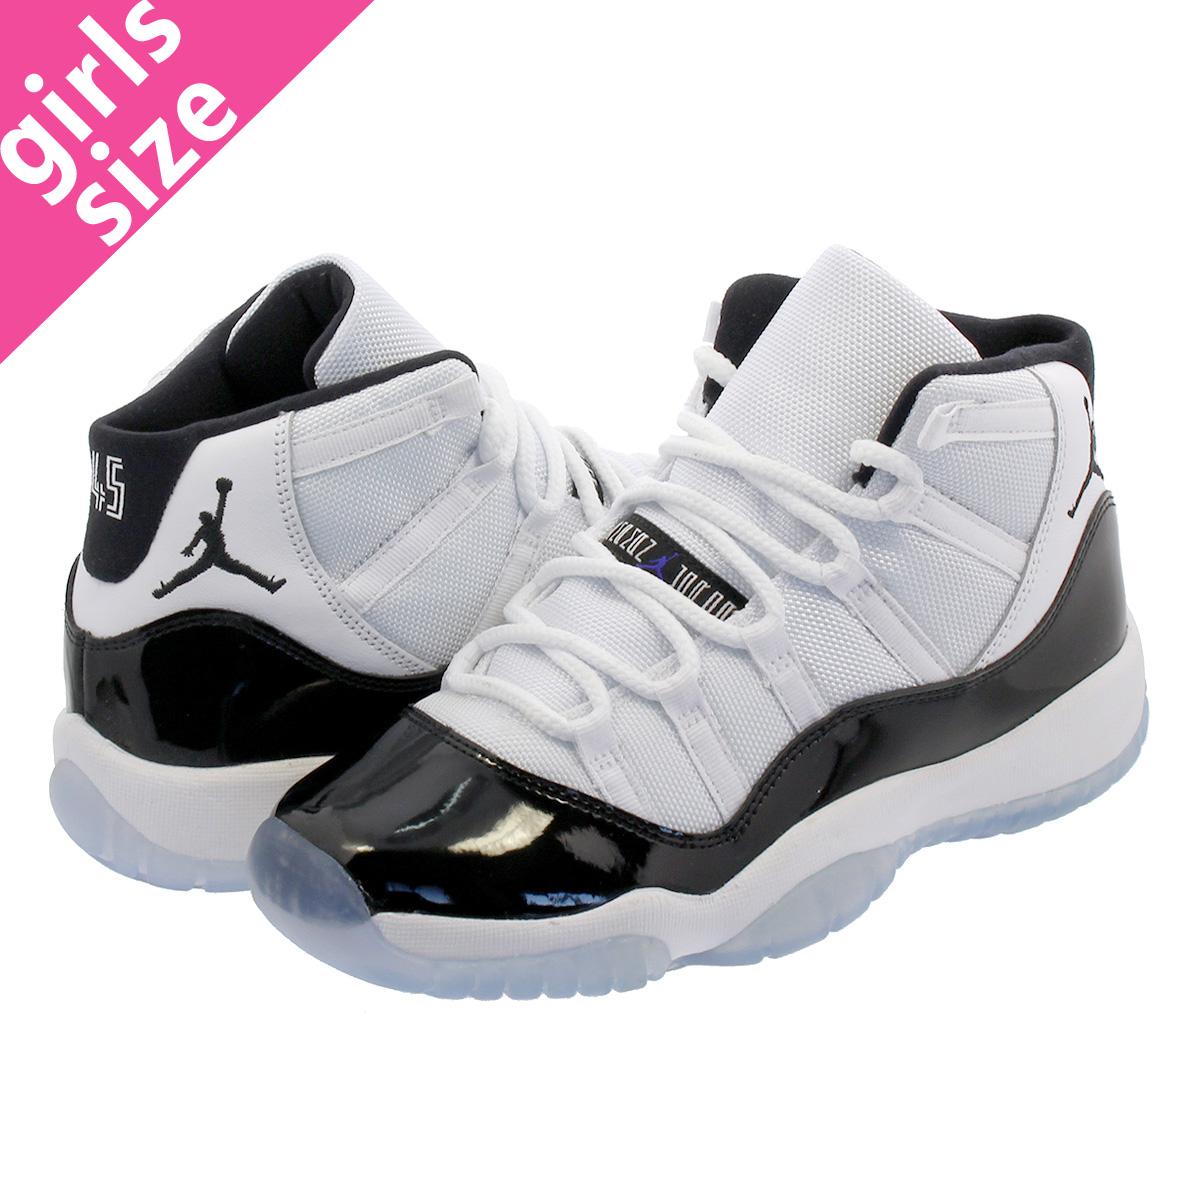 f0f6e9890dfa NIKE AIR JORDAN 11 RETRO BG Nike Air Jordan 11 nostalgic BG WHITE CONCORD BLACK  378